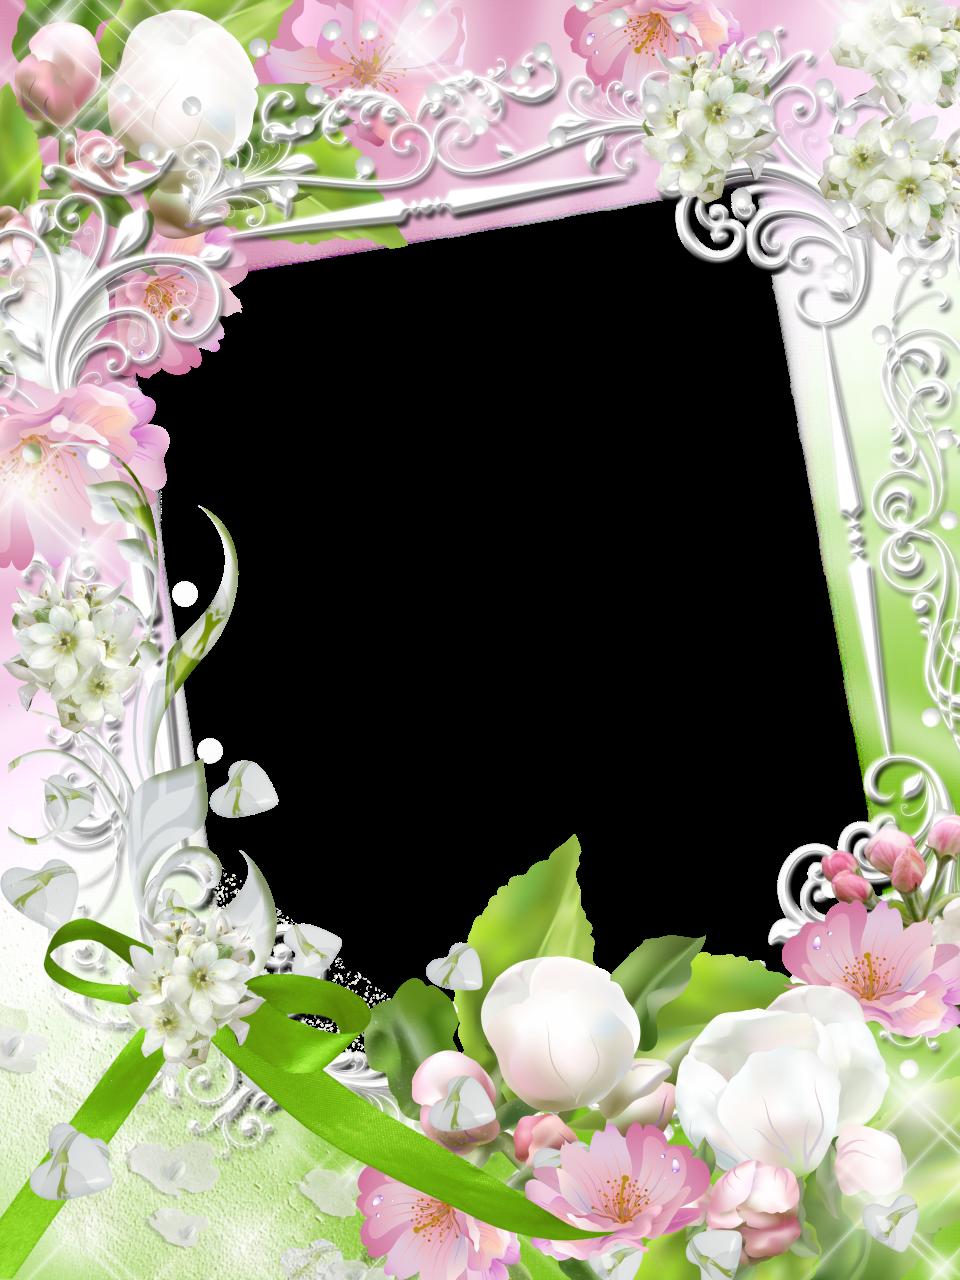 http://img-fotki.yandex.ru/get/4124/41771327.358/0_87adb_622d9190_orig.png